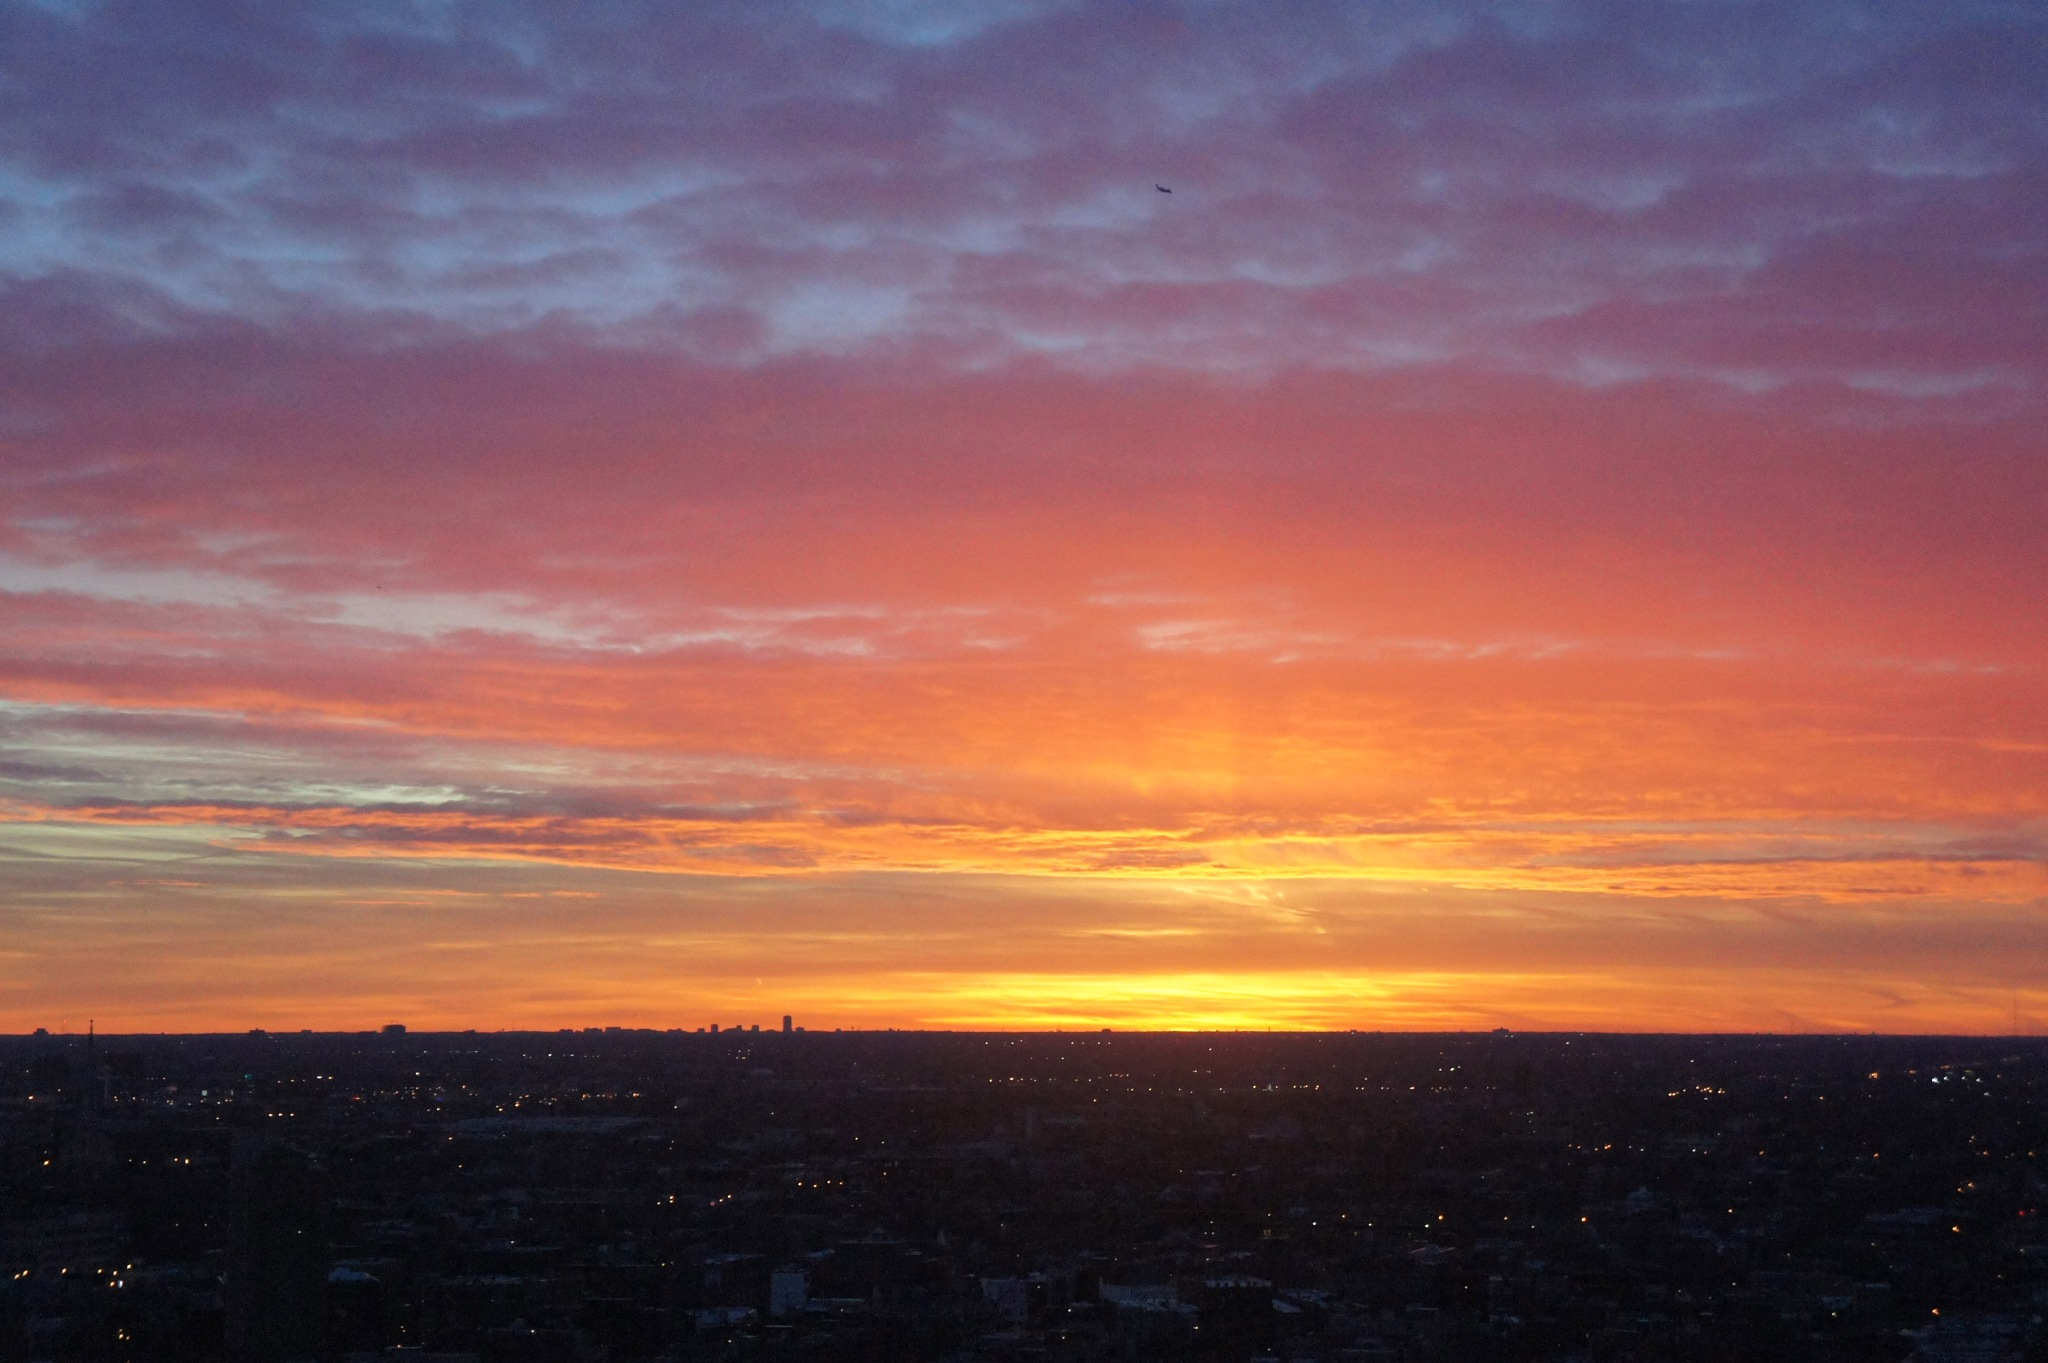 Sunset Unfiltered, Chicago, Feb. 15, 2017 by BobBenenson